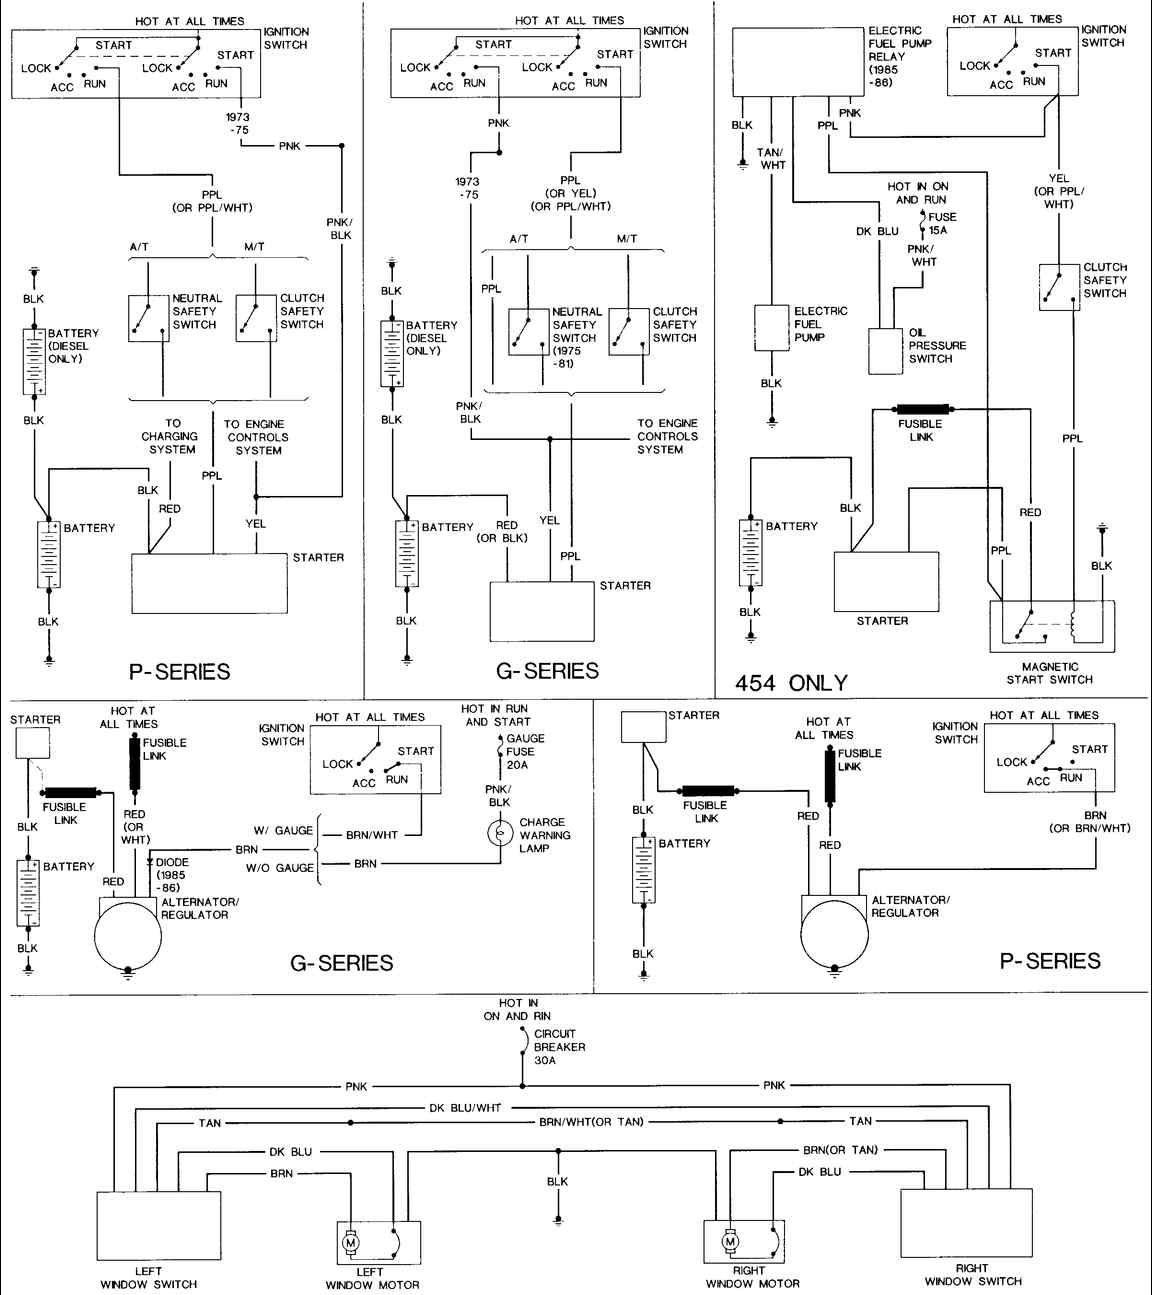 Remarkable Chevy G30 Wiring Diagram General Wiring Diagram Data Wiring Cloud Itislusmarecoveryedborg